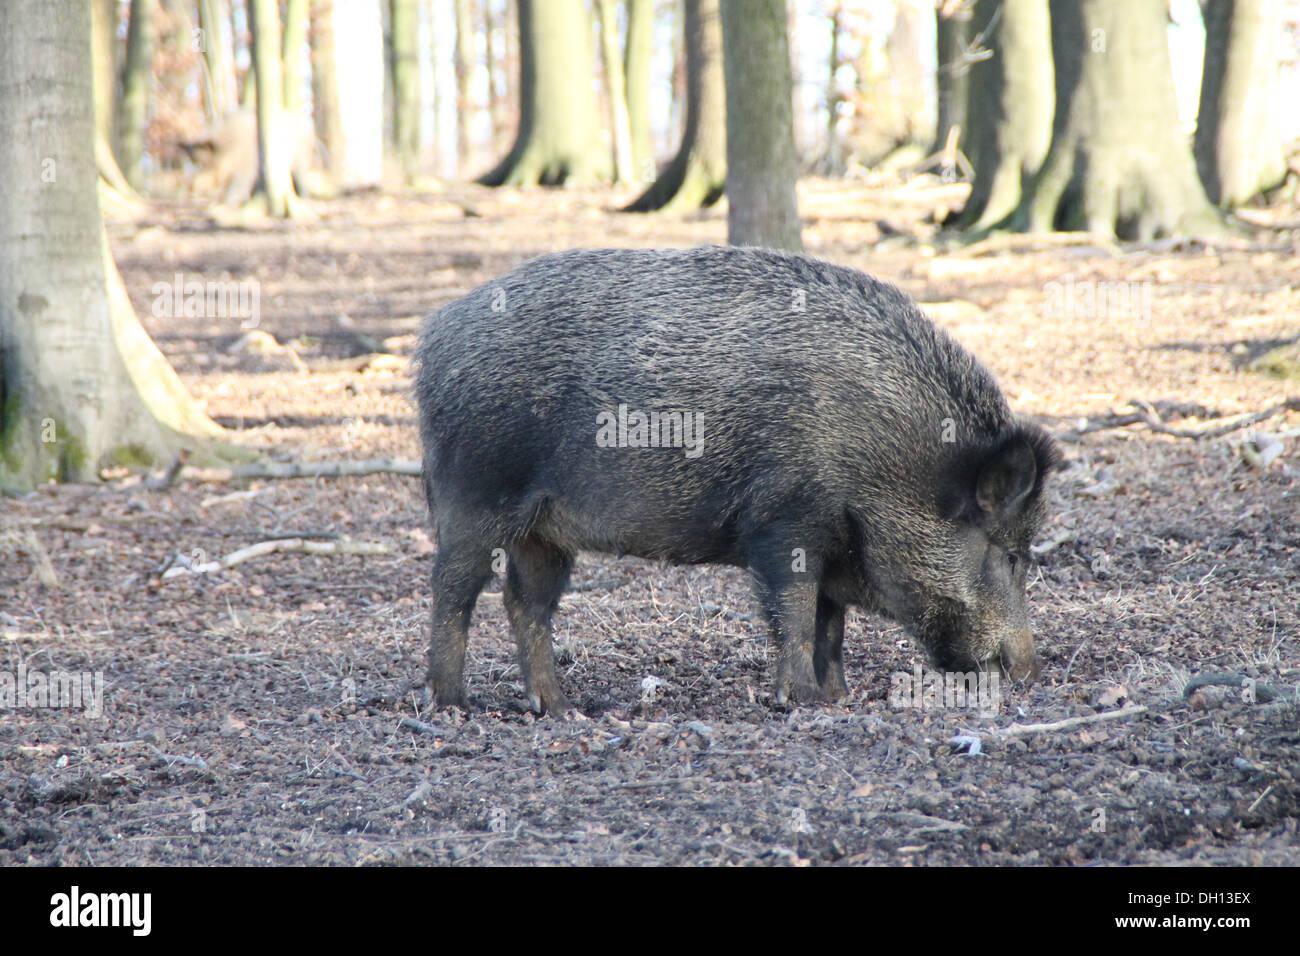 A boar - Stock Image